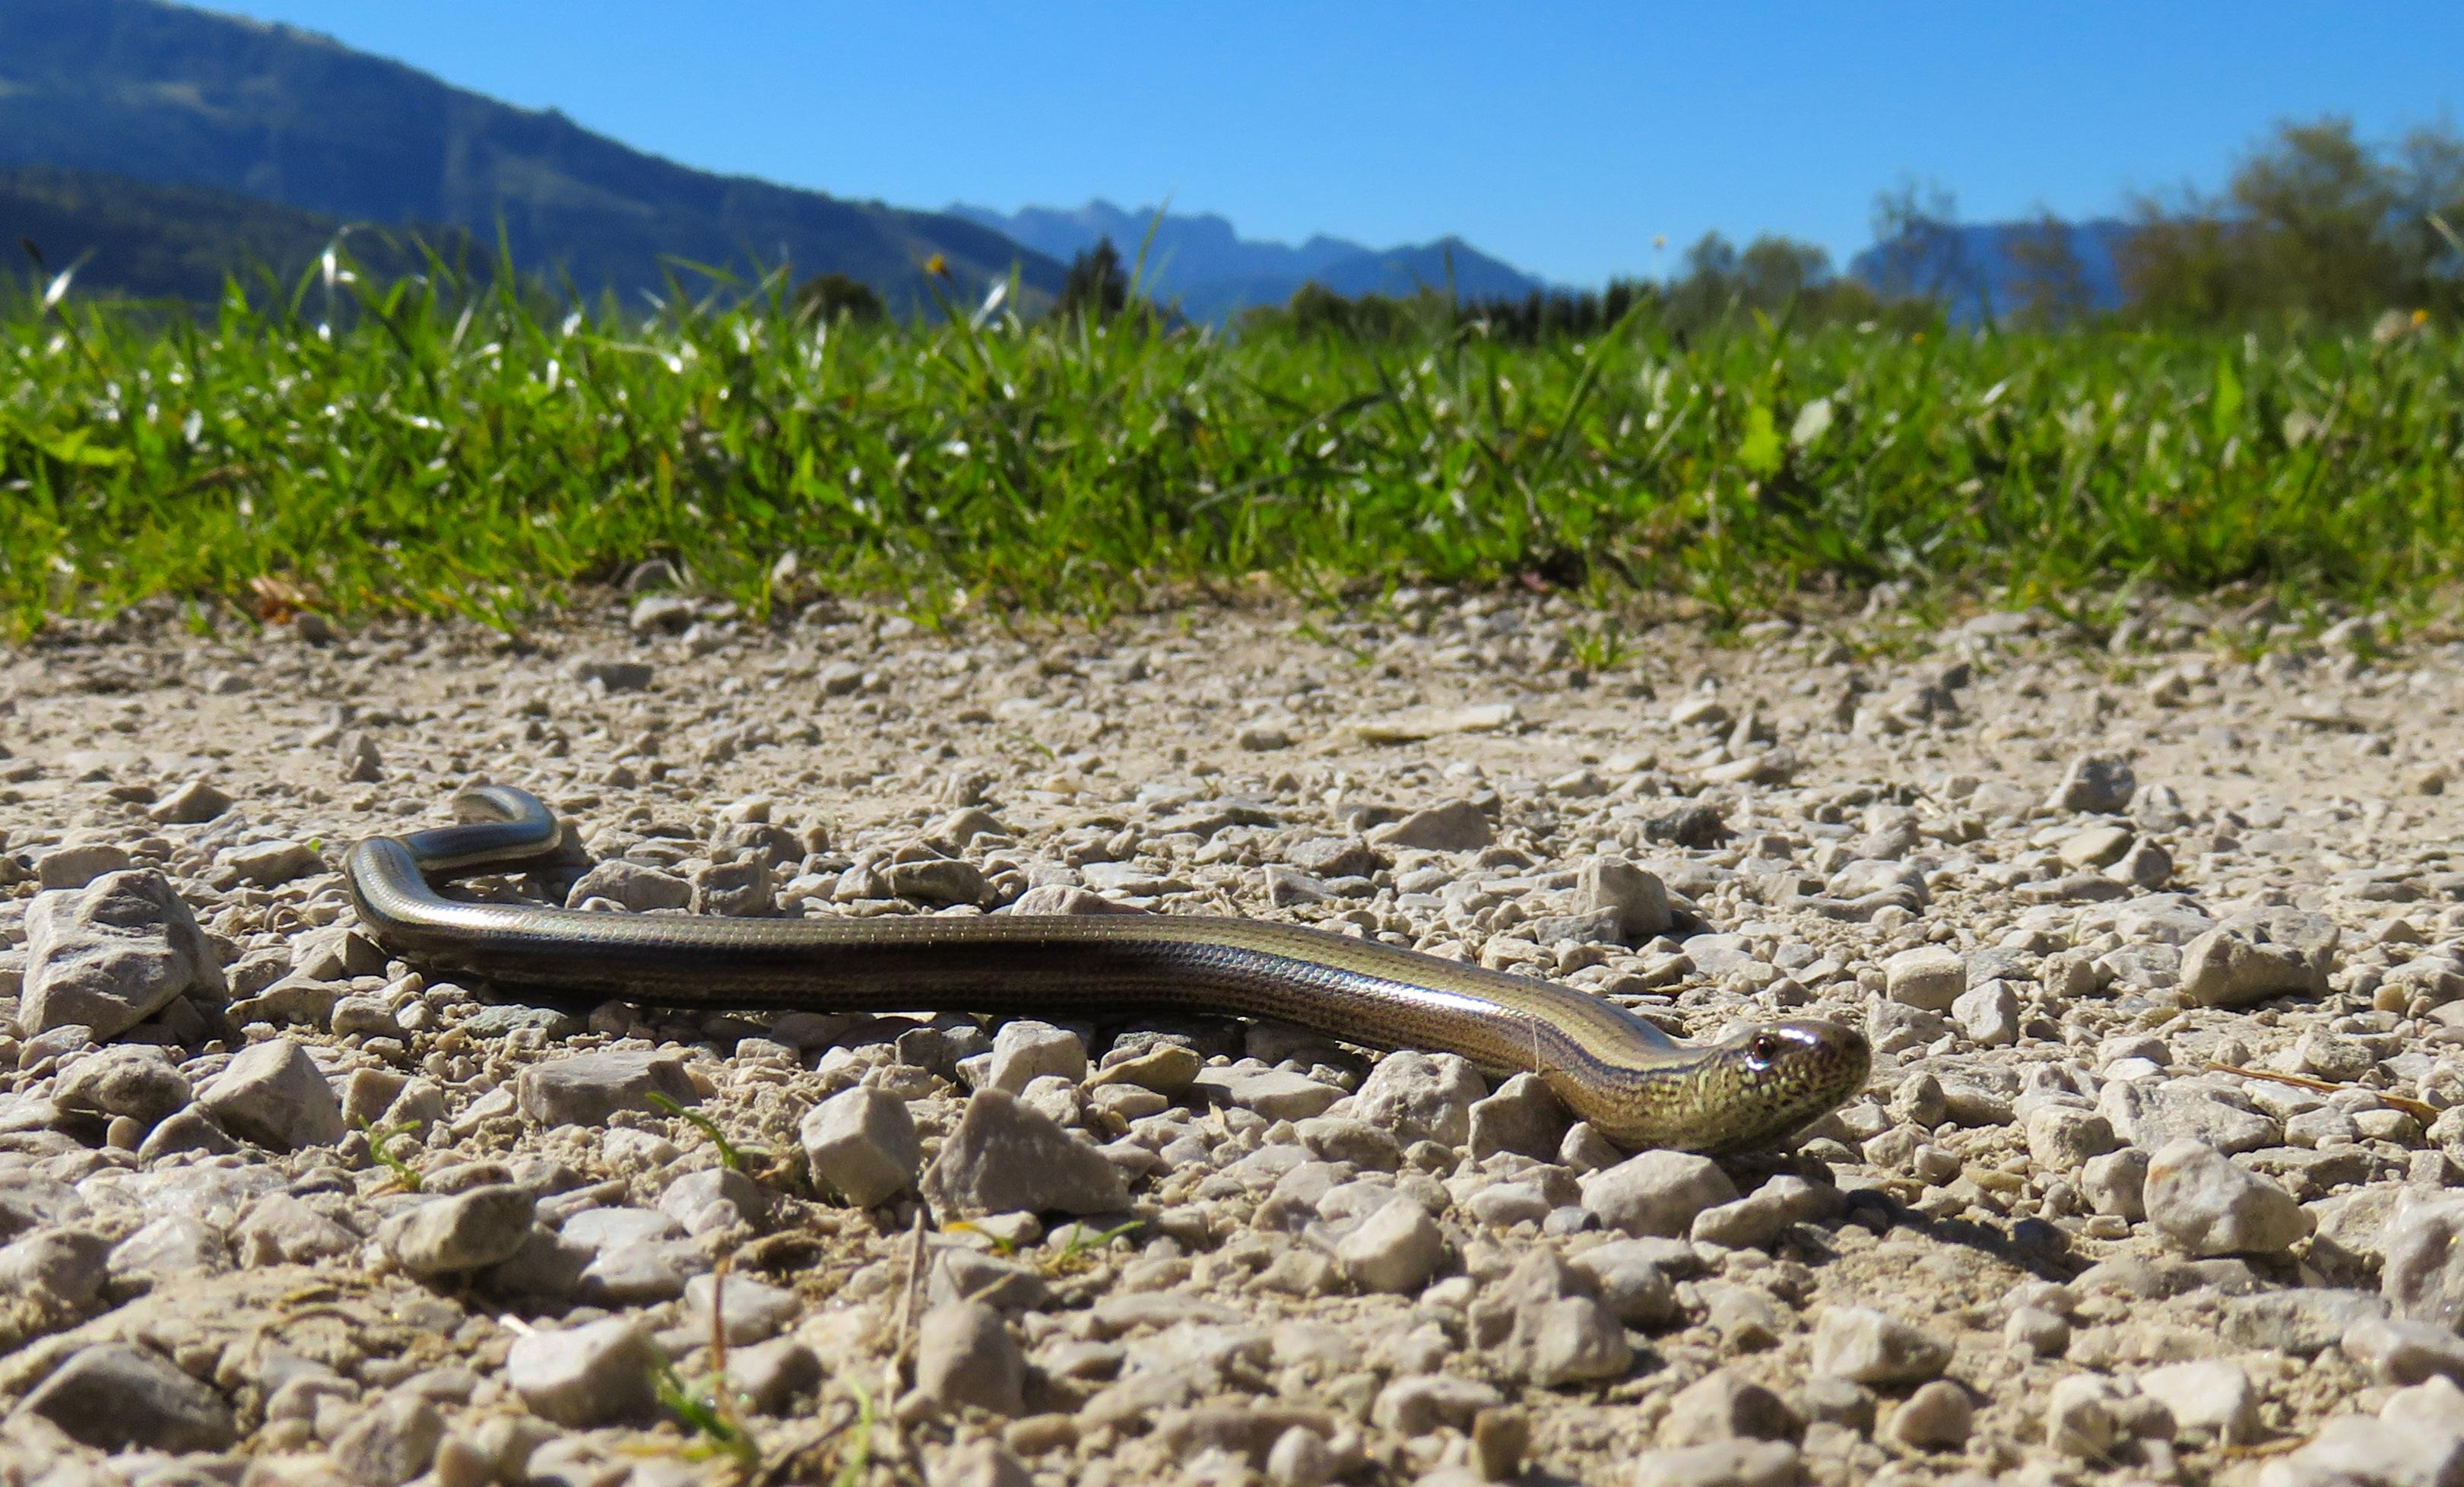 Ползущая змея картинки